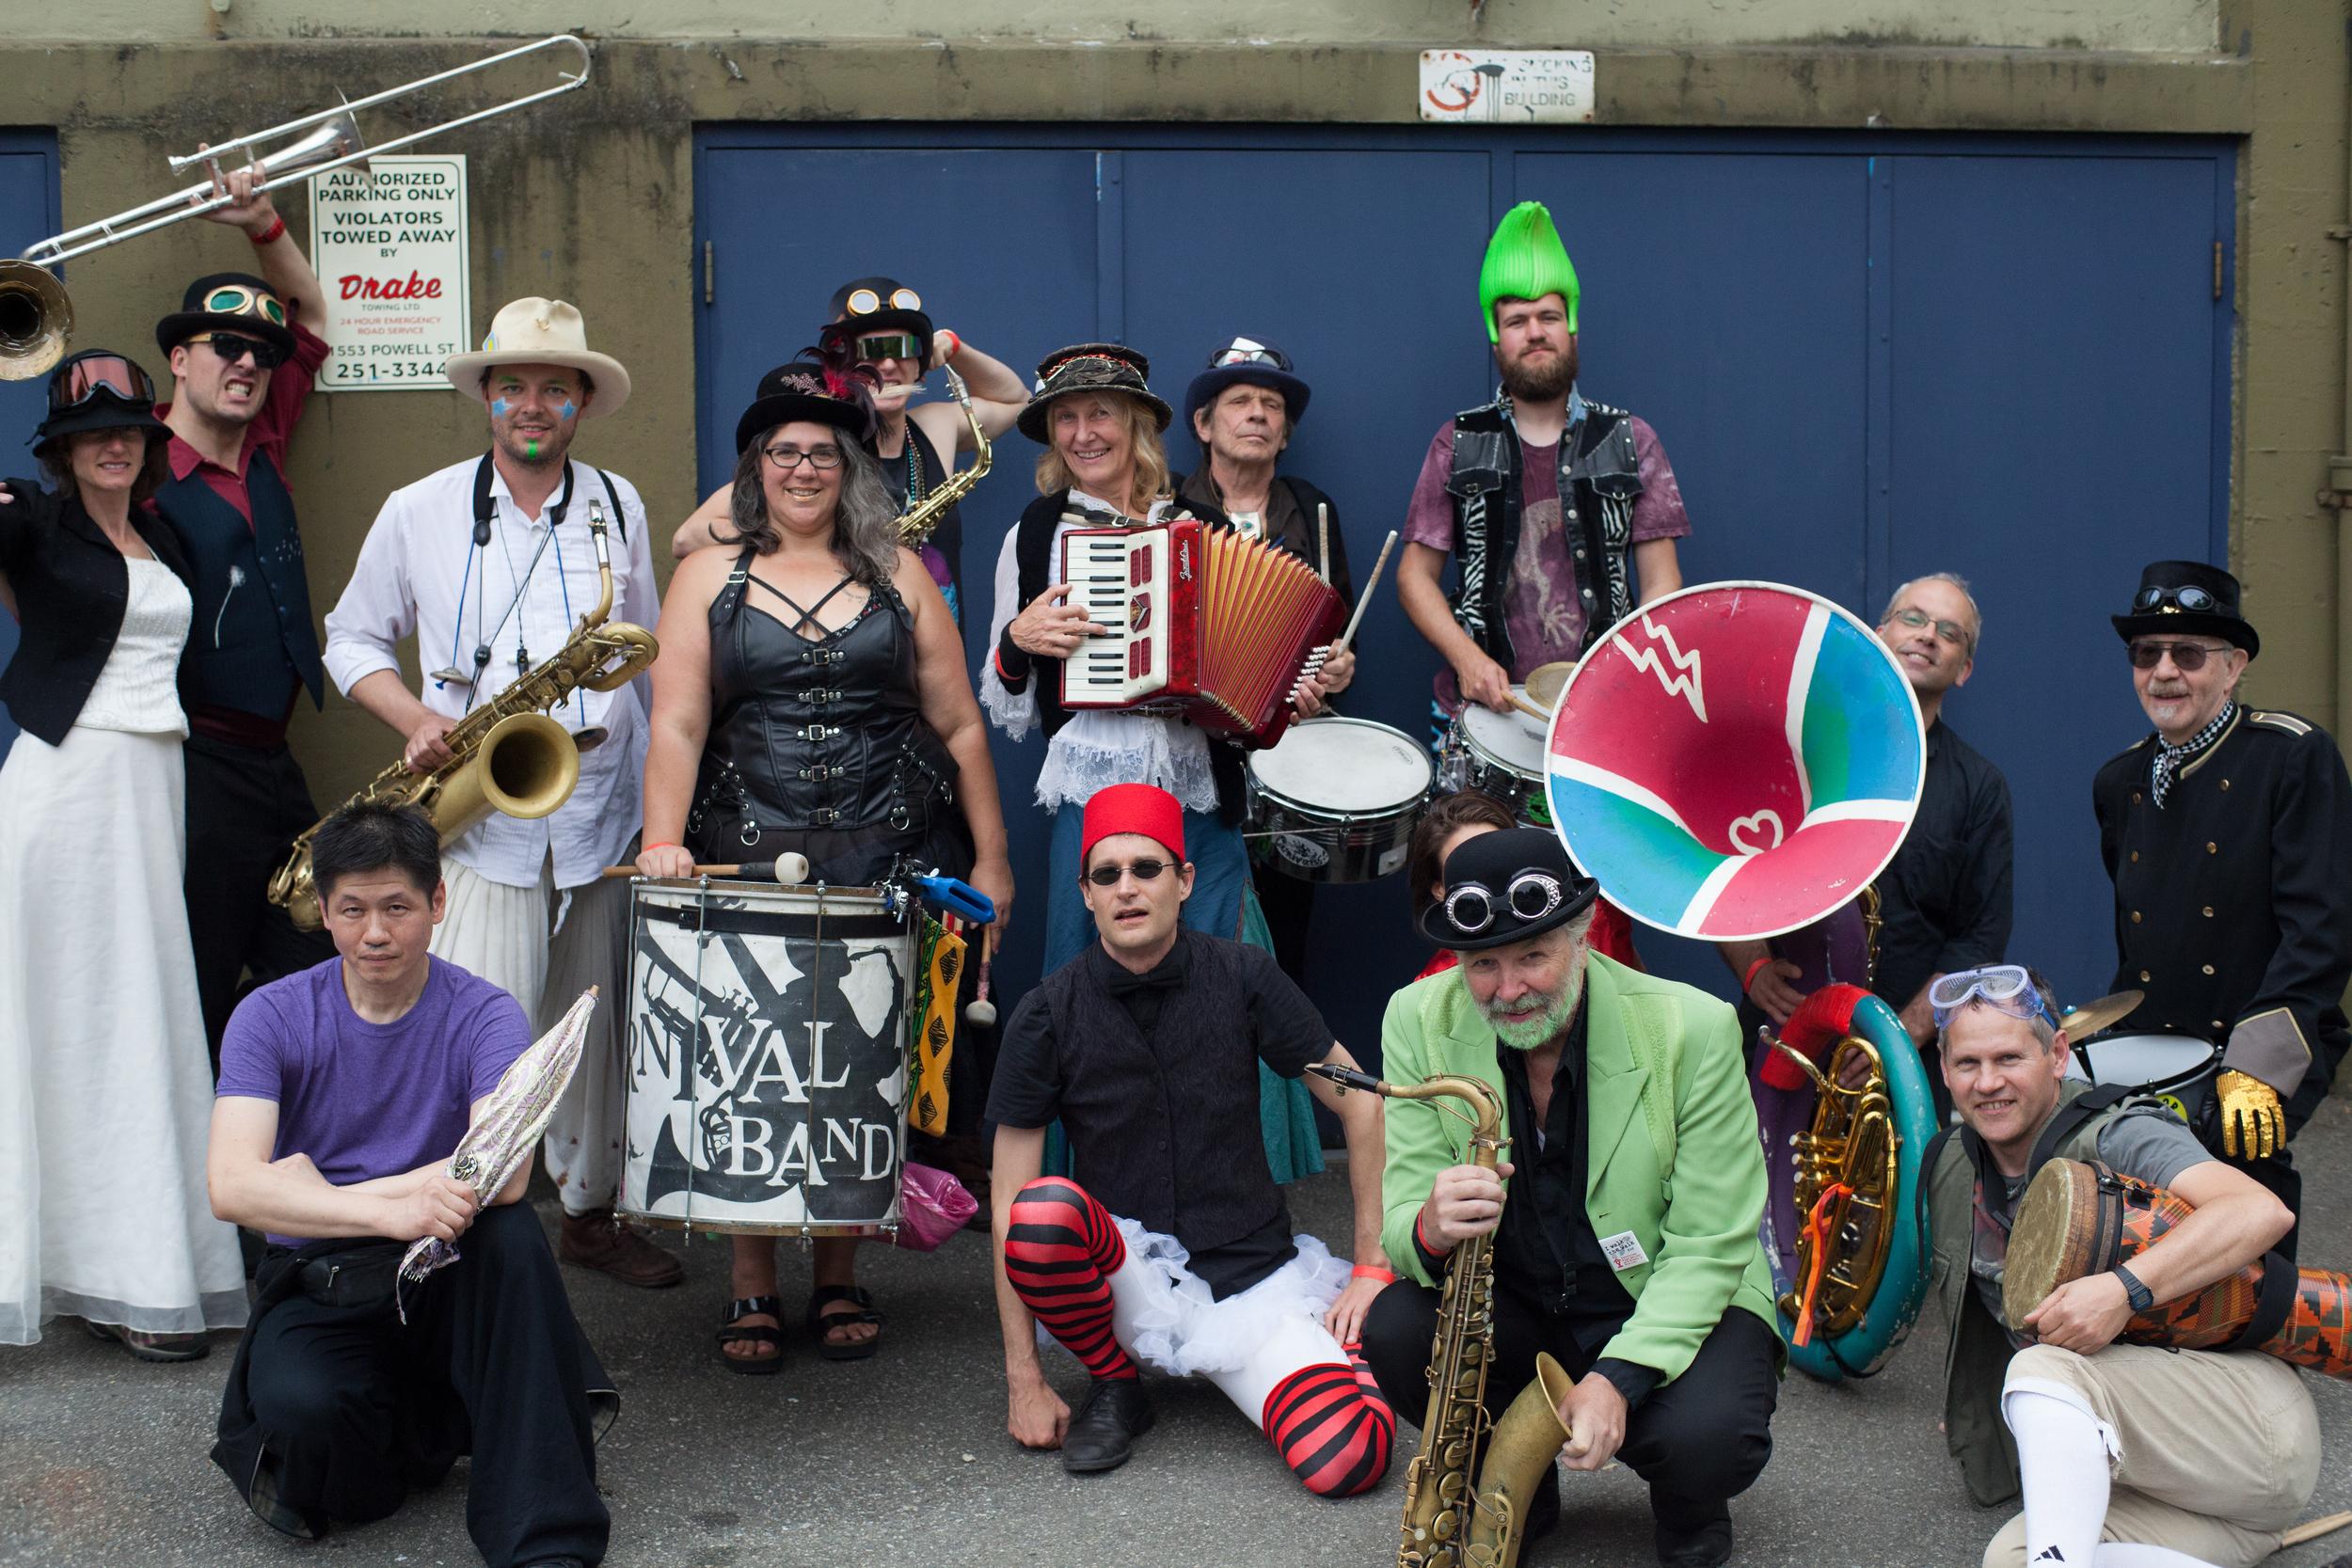 The Carnival Band motley crew group shot!